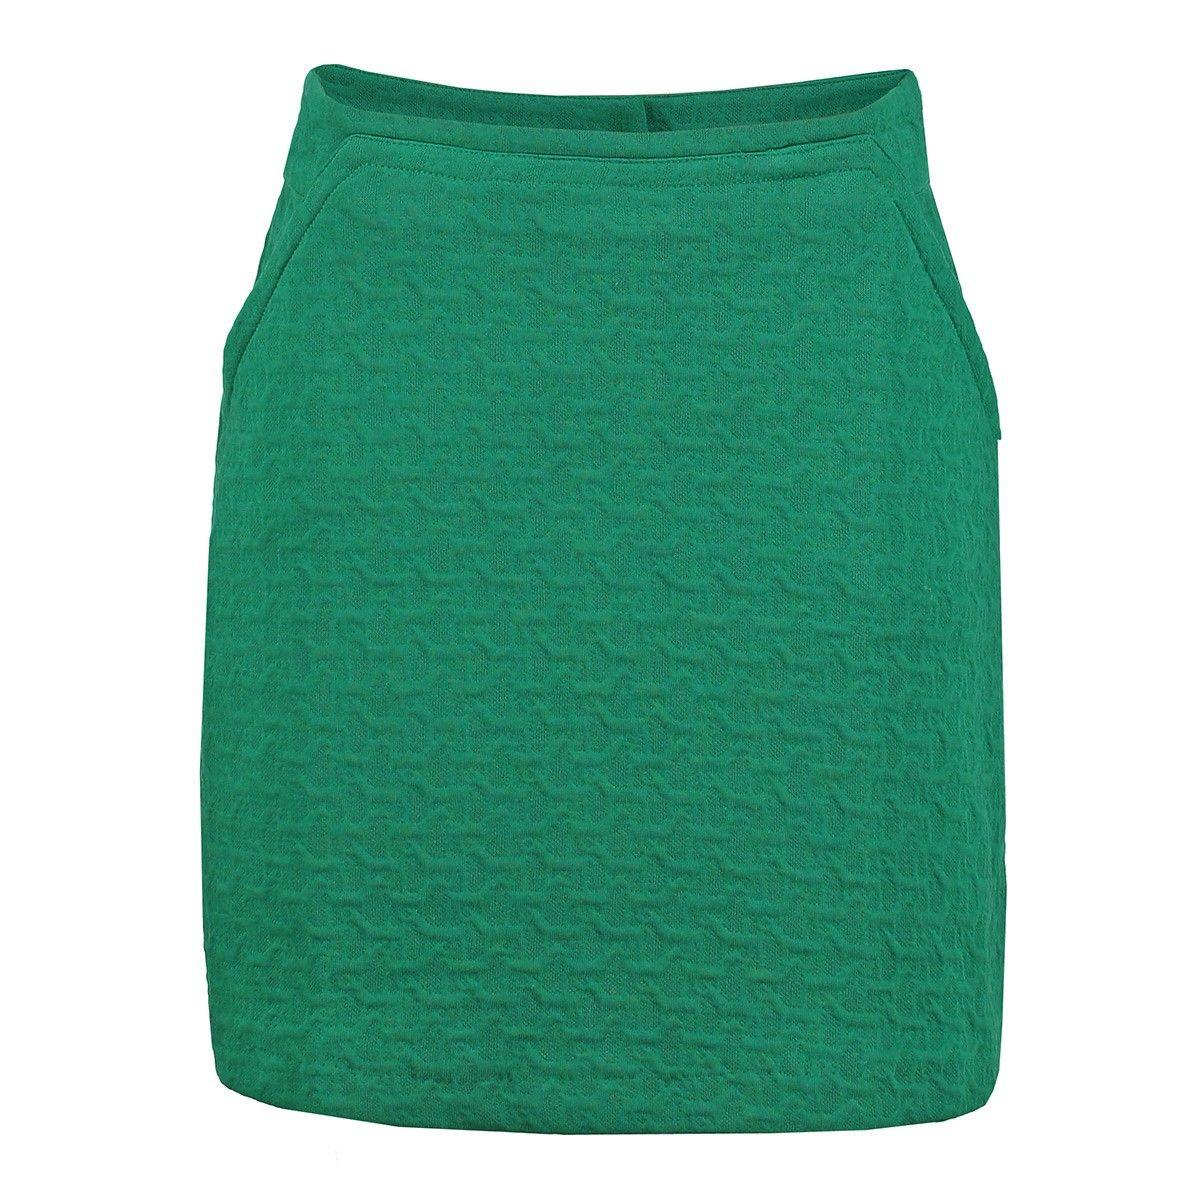 Super Groene jurk wow to go – Populaire jurken uit de hele wereld MP57